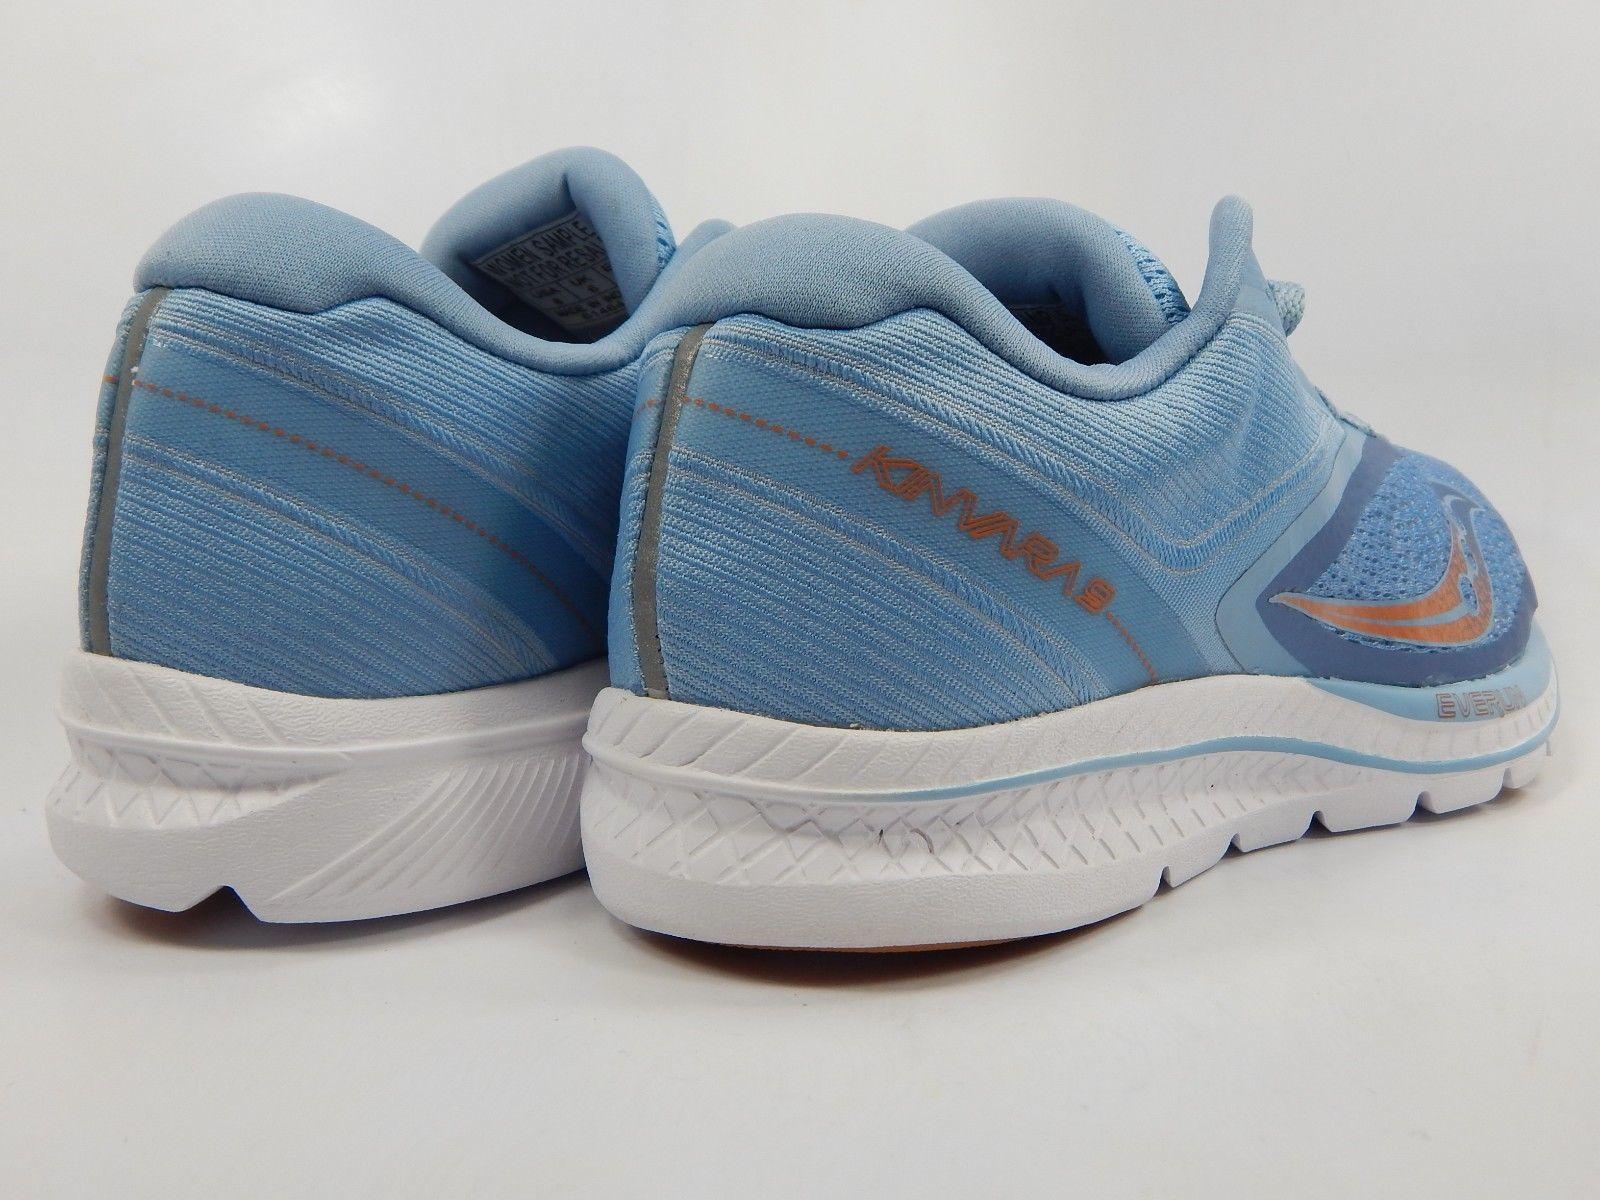 Saucony Kinvara 9 Women's Running Shoes Sz US 8 M (B) EU 39 Blue Denim S10418-30